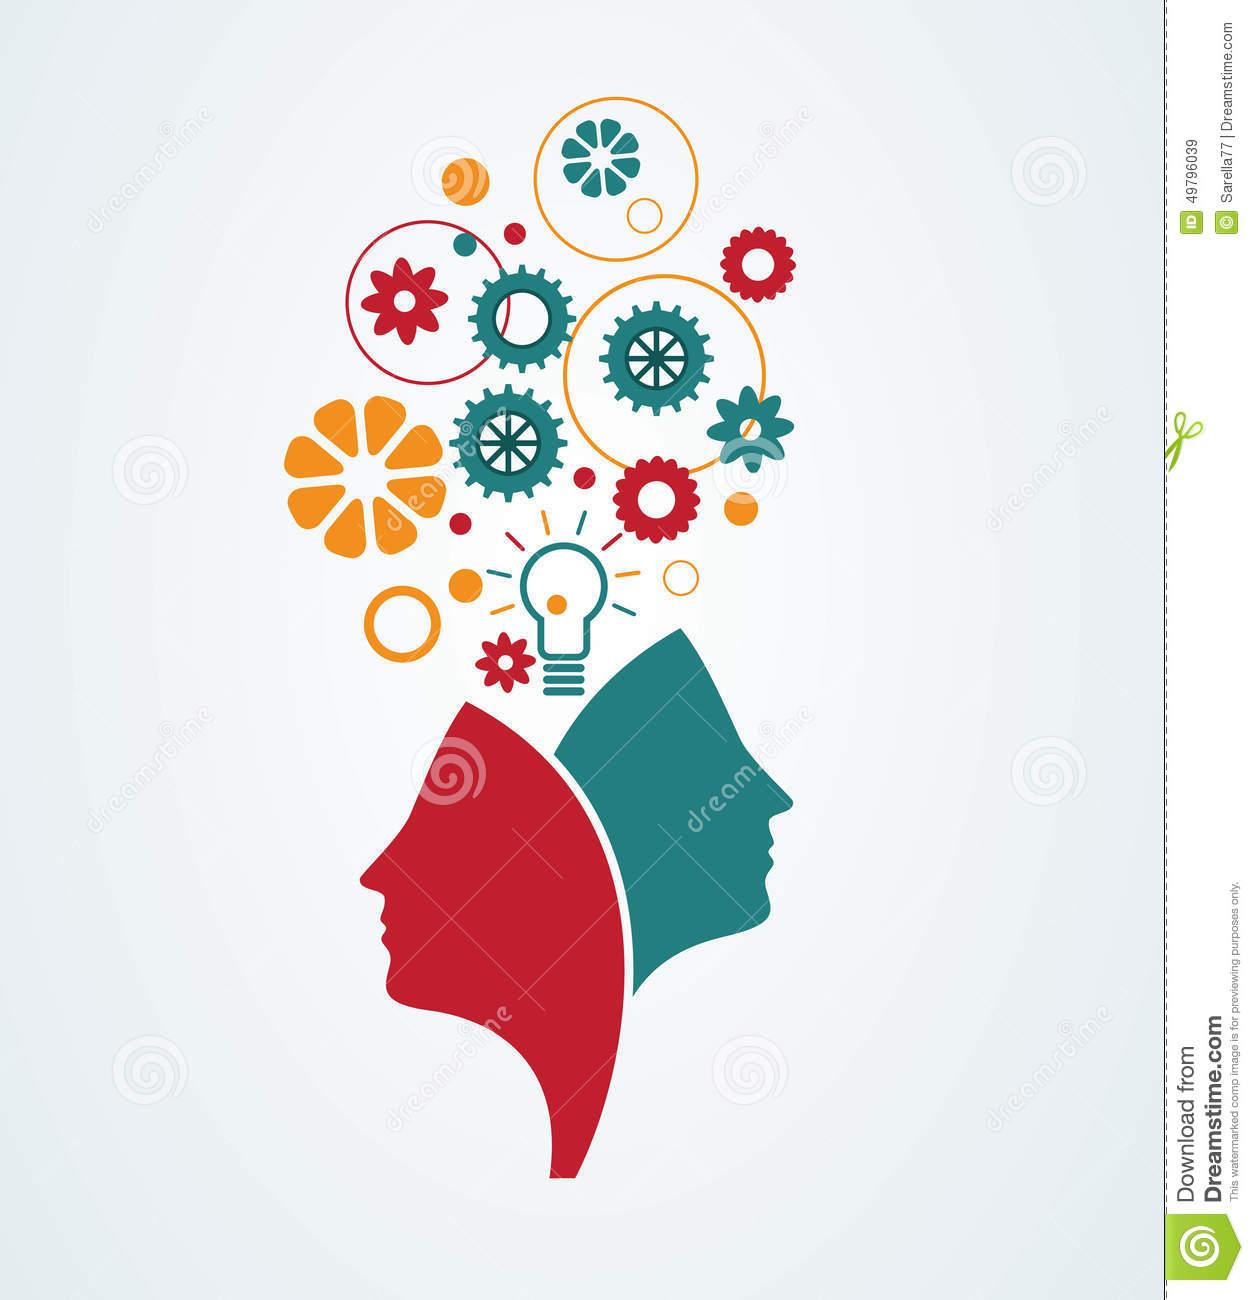 Mind clipart creativity Minds creative (60+) clipart illustration